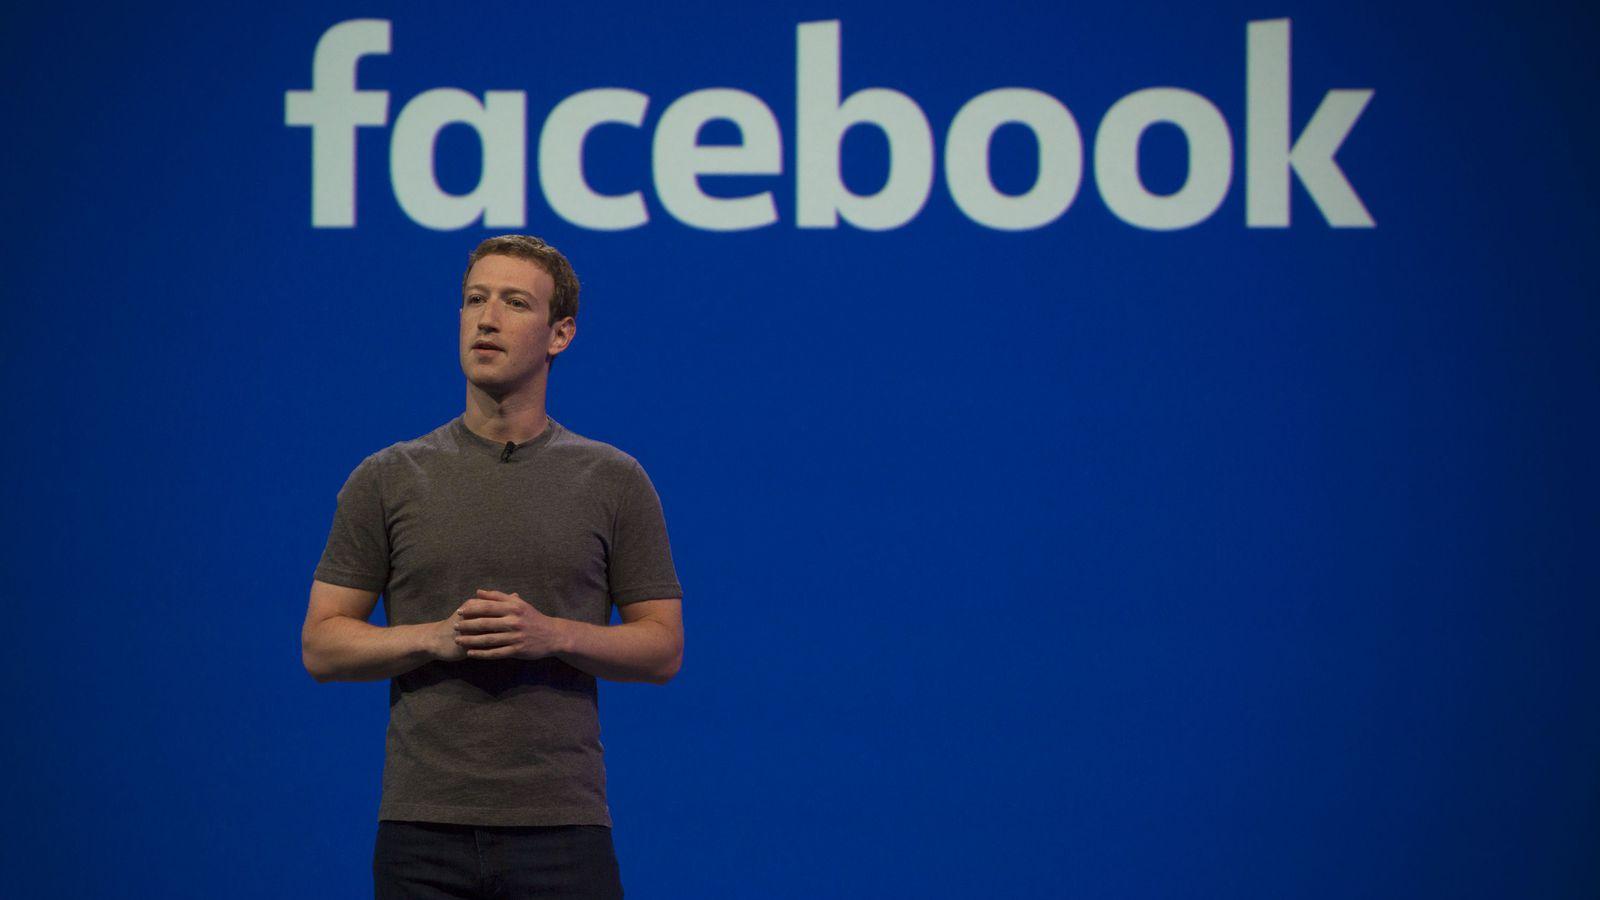 Výsledek obrázku pro mark zuckerberg